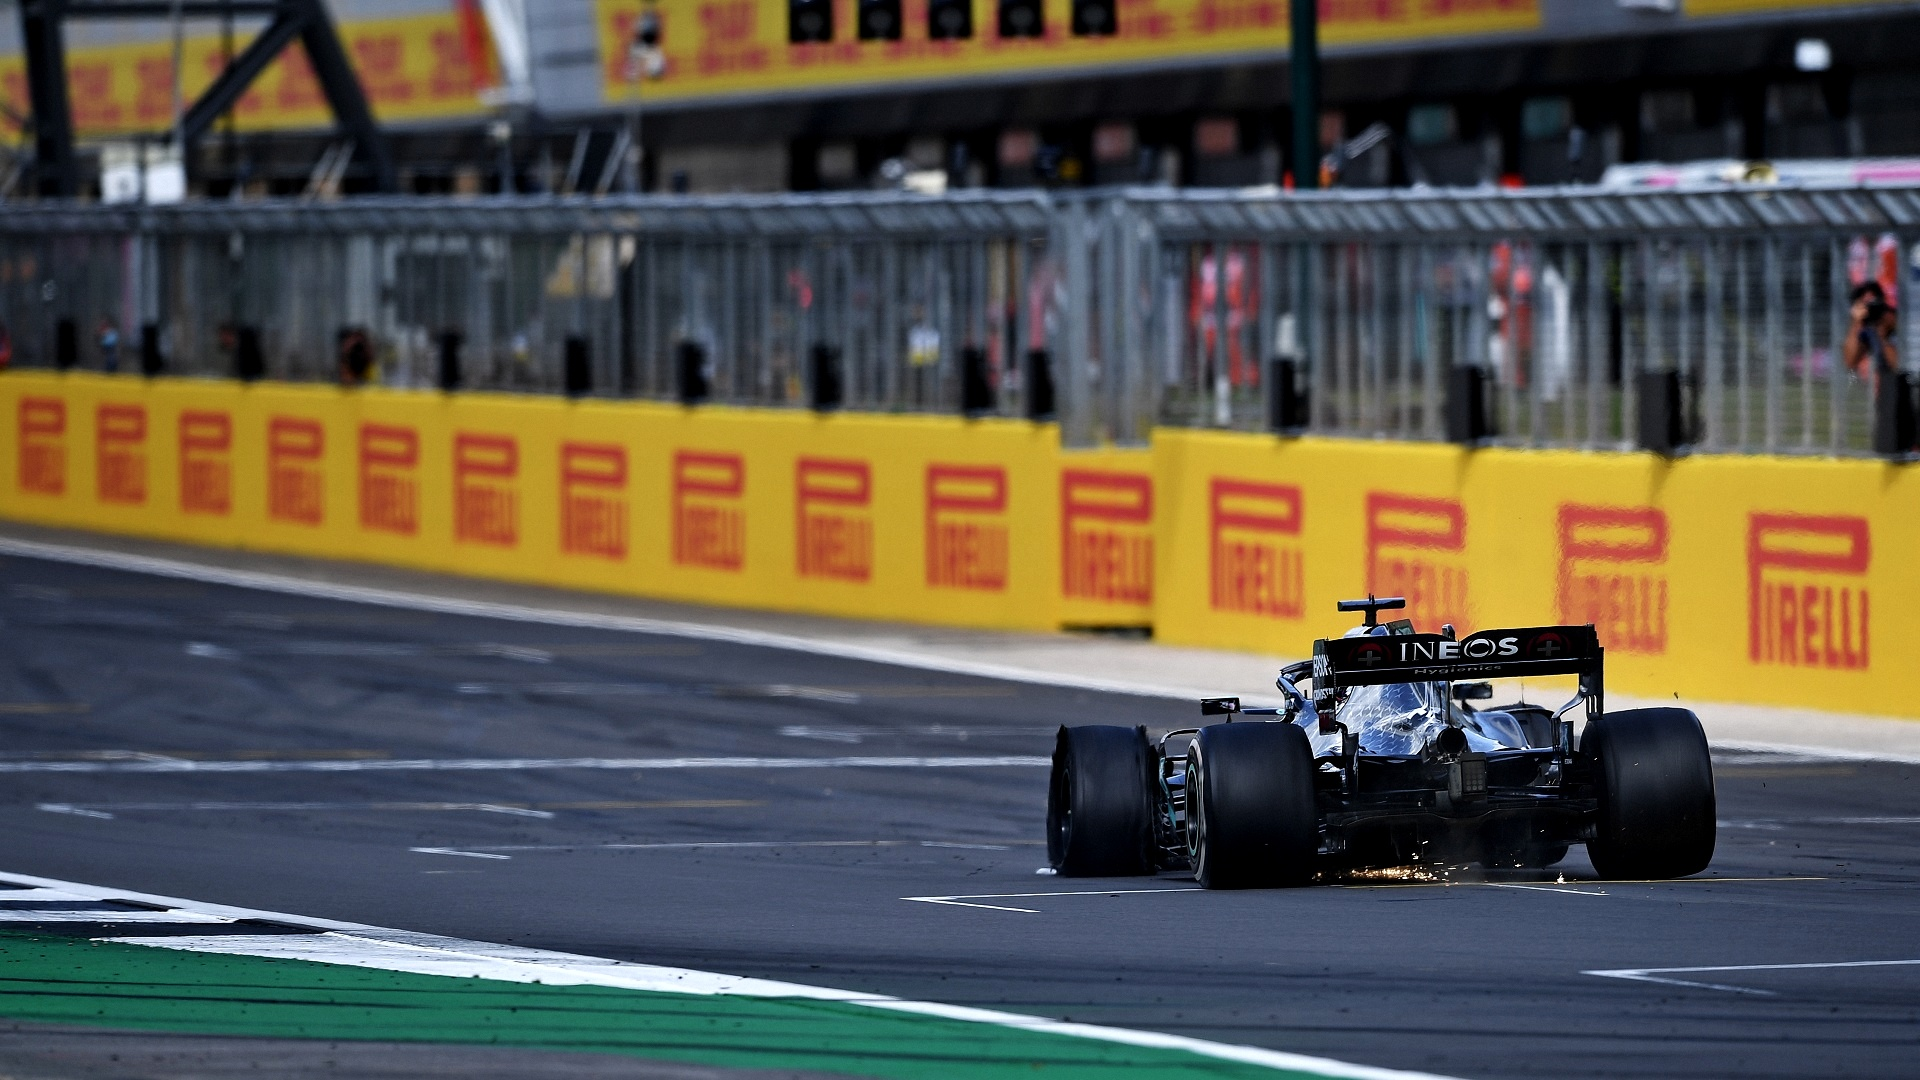 2020-08-02 British F1 Formula 1 Hamilton Mercedes